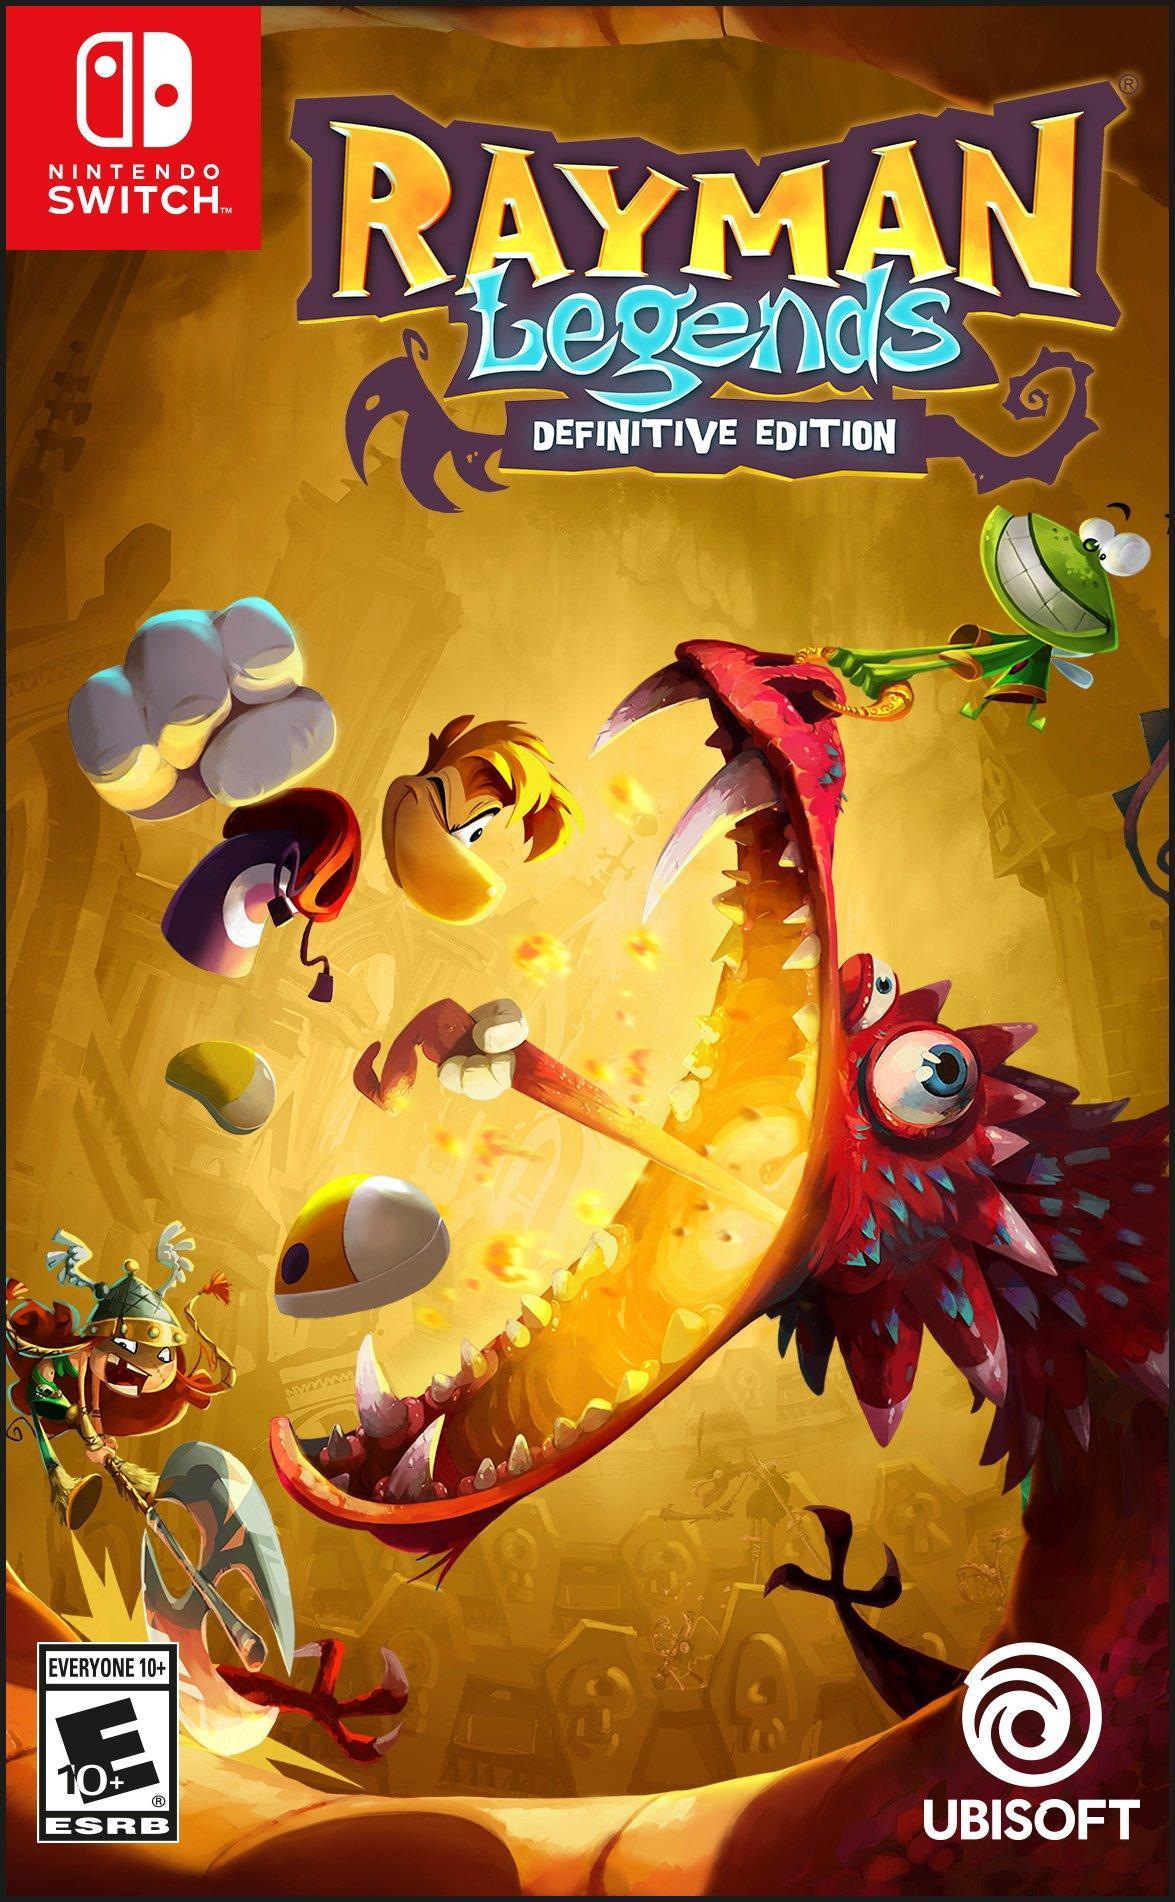 Rayman Legends - Definitive Edition (Nintendo Switch) - £14.85 delivered @ Base